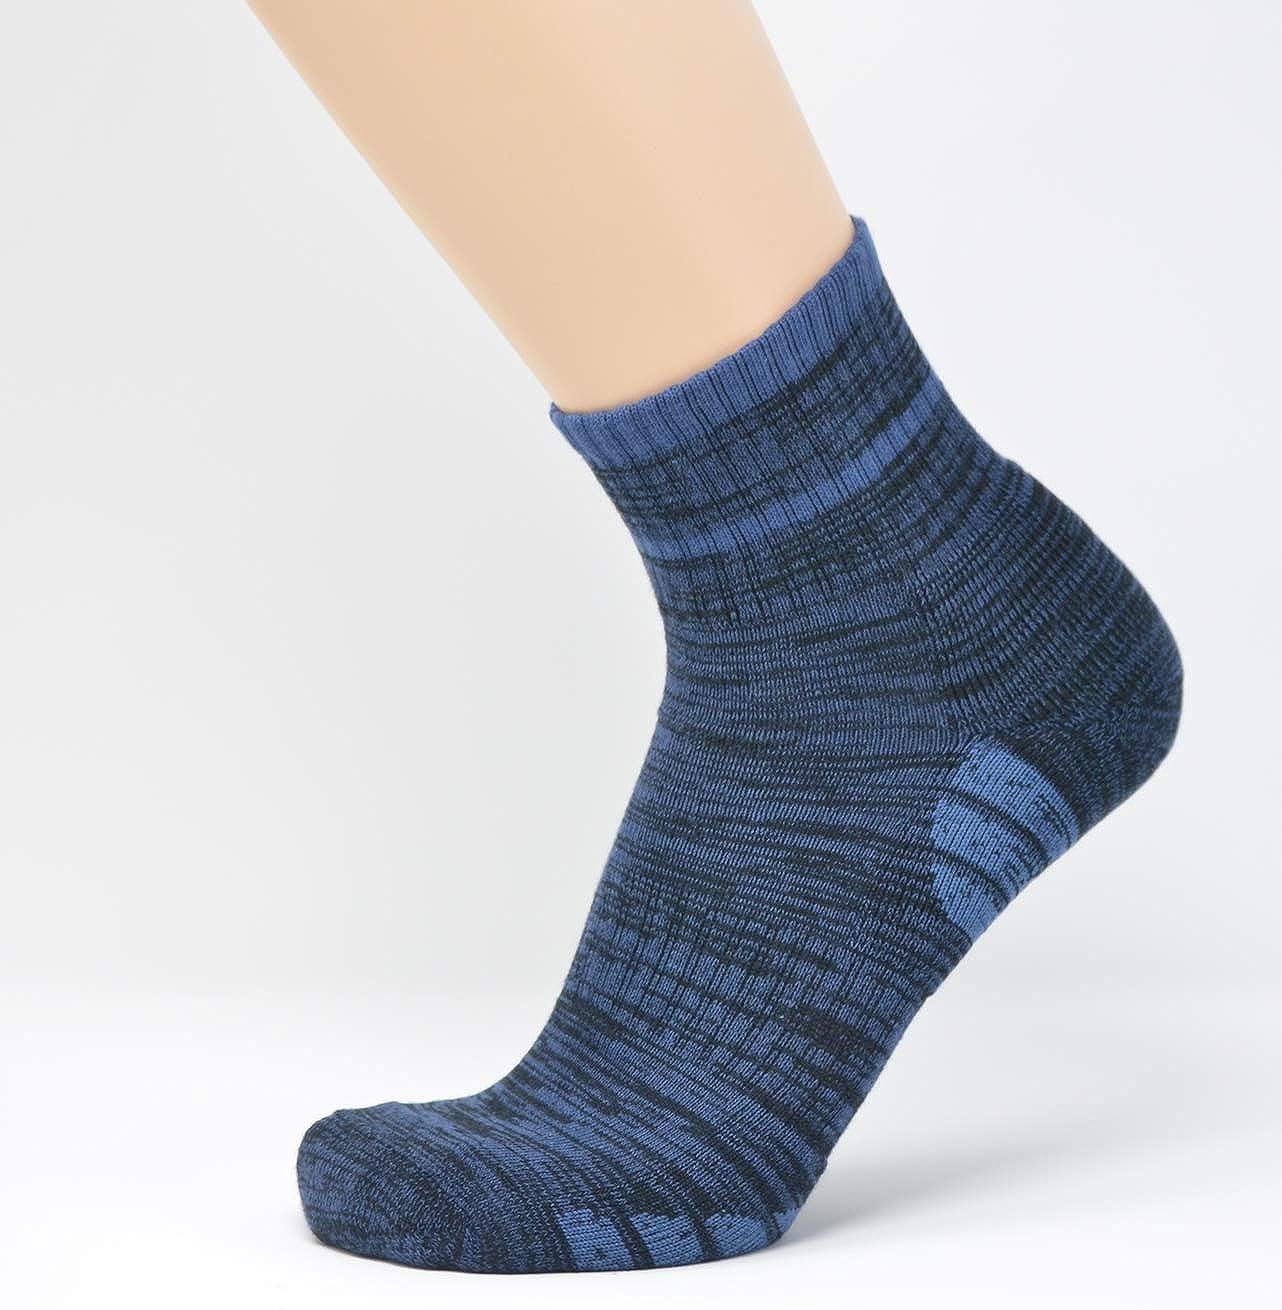 4-Pack u/&i Mens Performance Cushion Cotton Comfort Mid Cut Quarter Athletic Socks